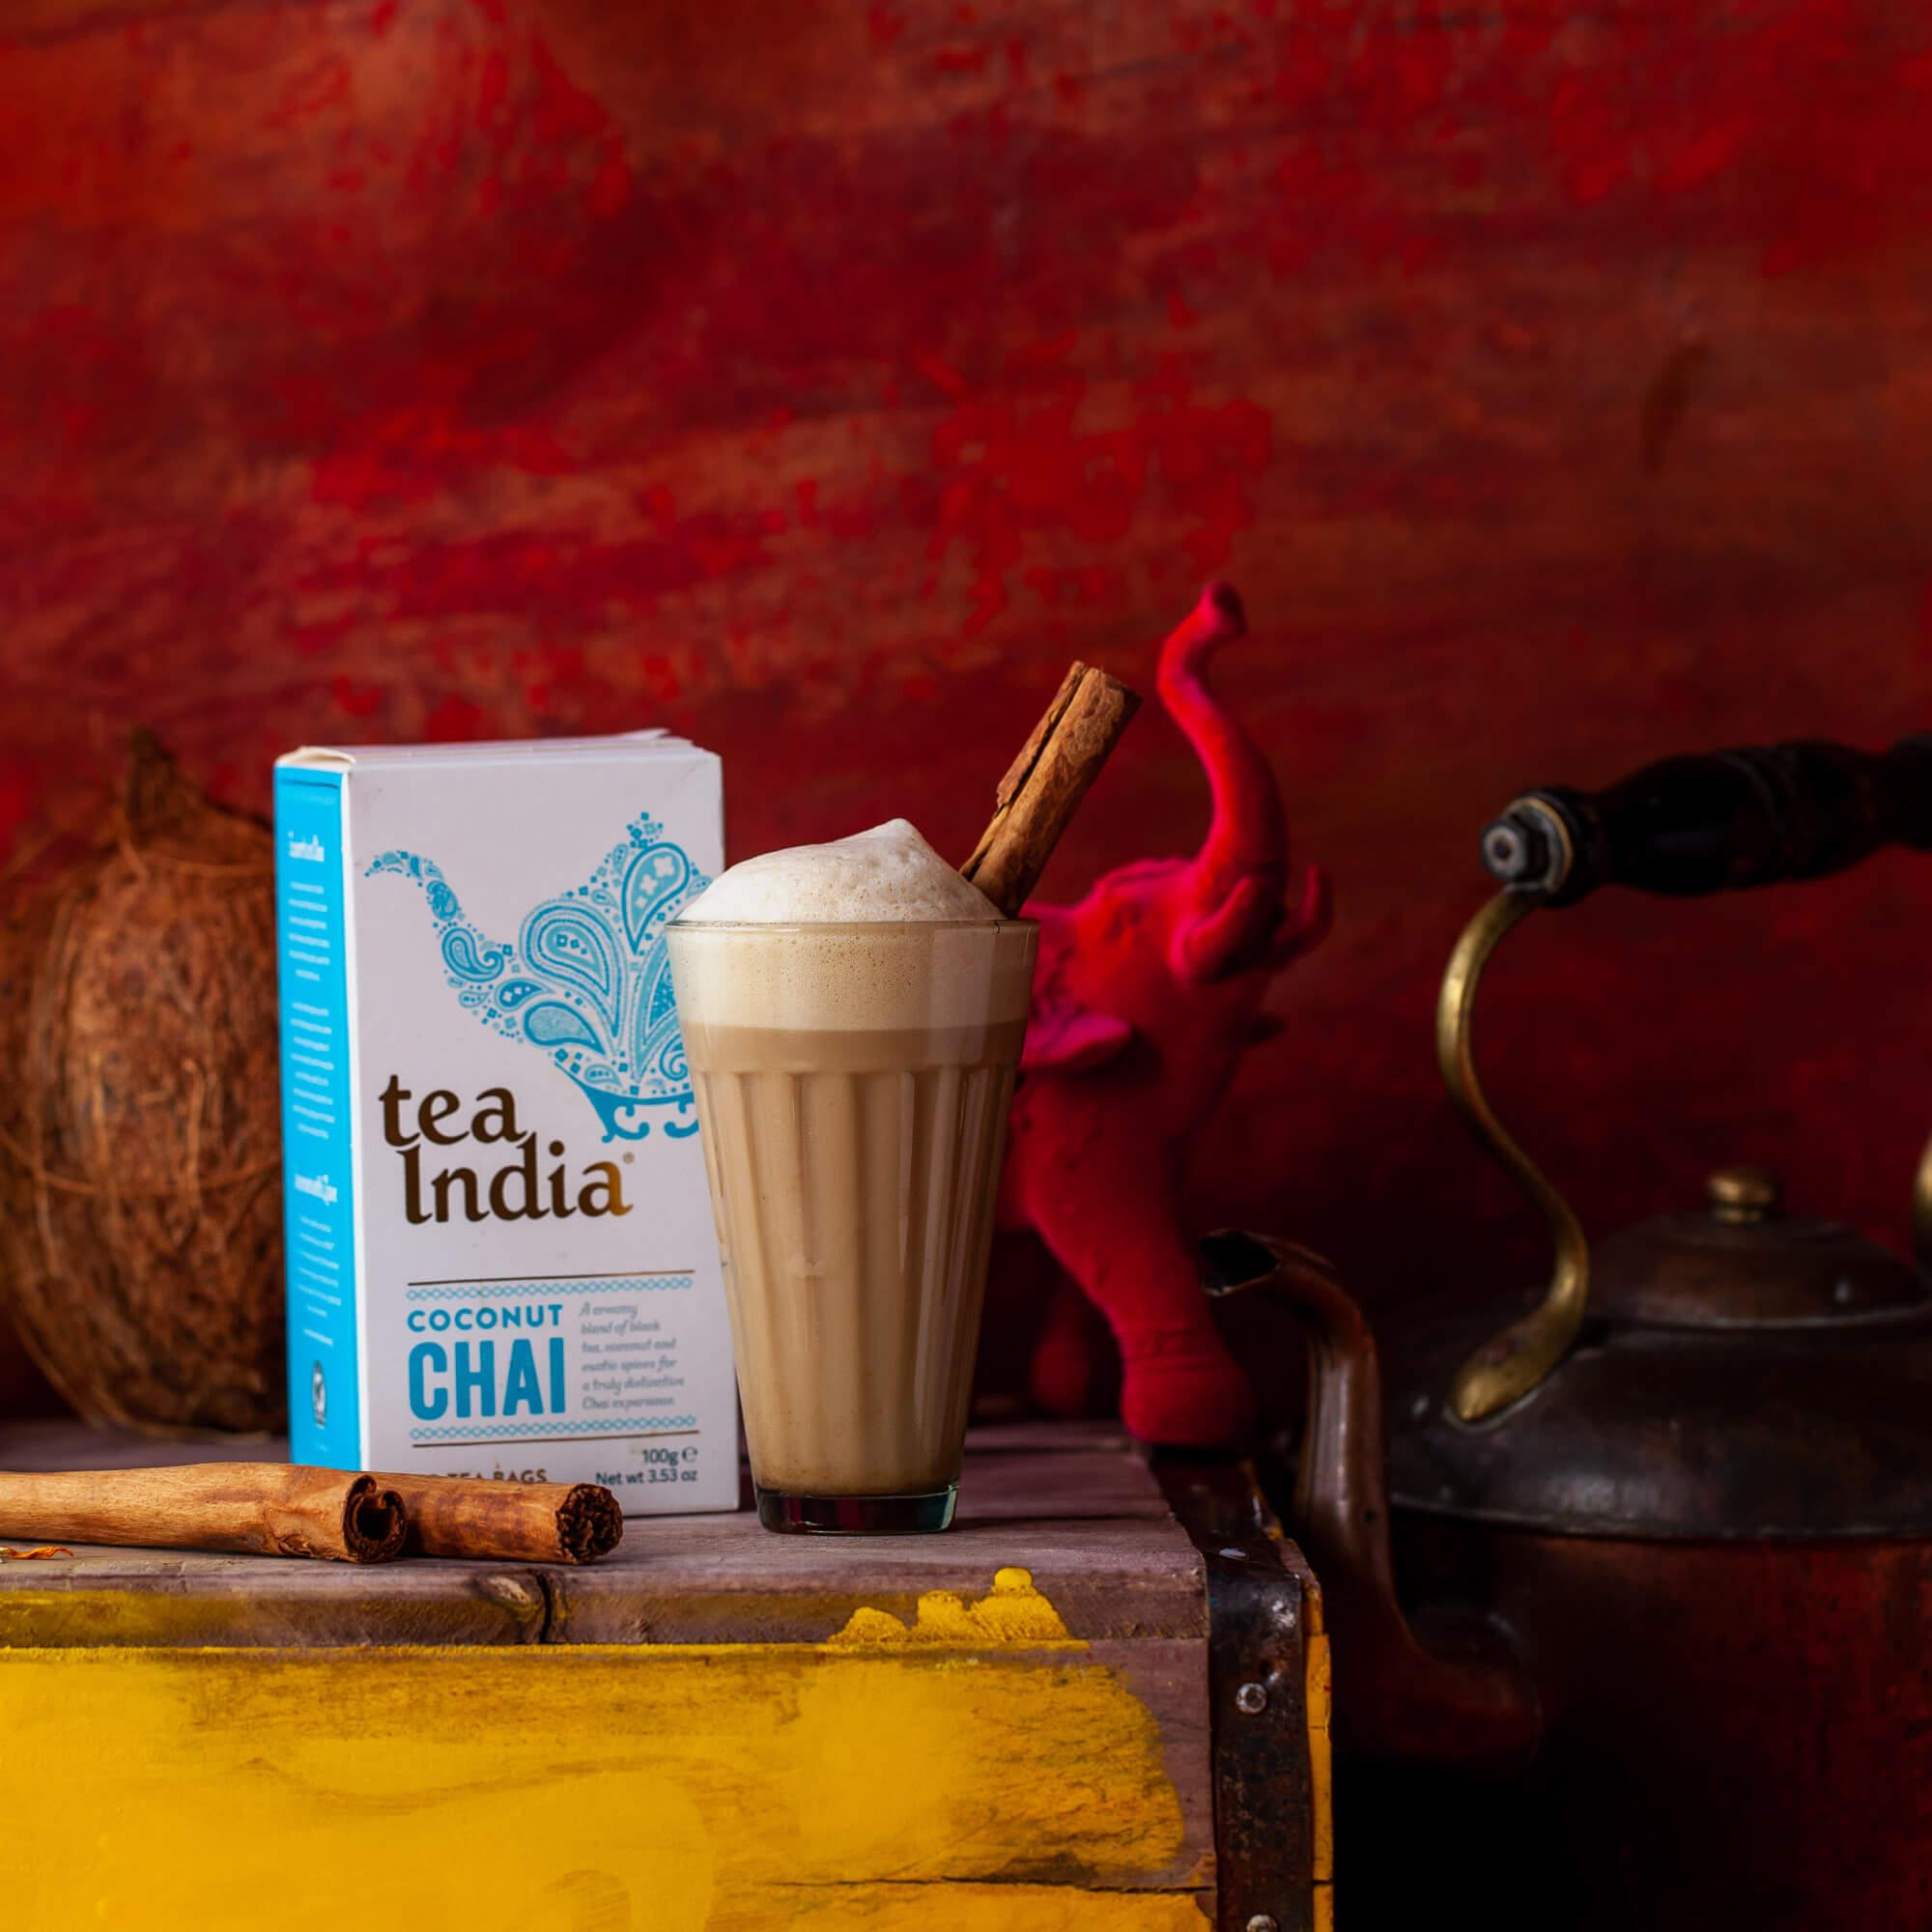 Food photography- tea Indai- dorset -Lara Jane Thorpe